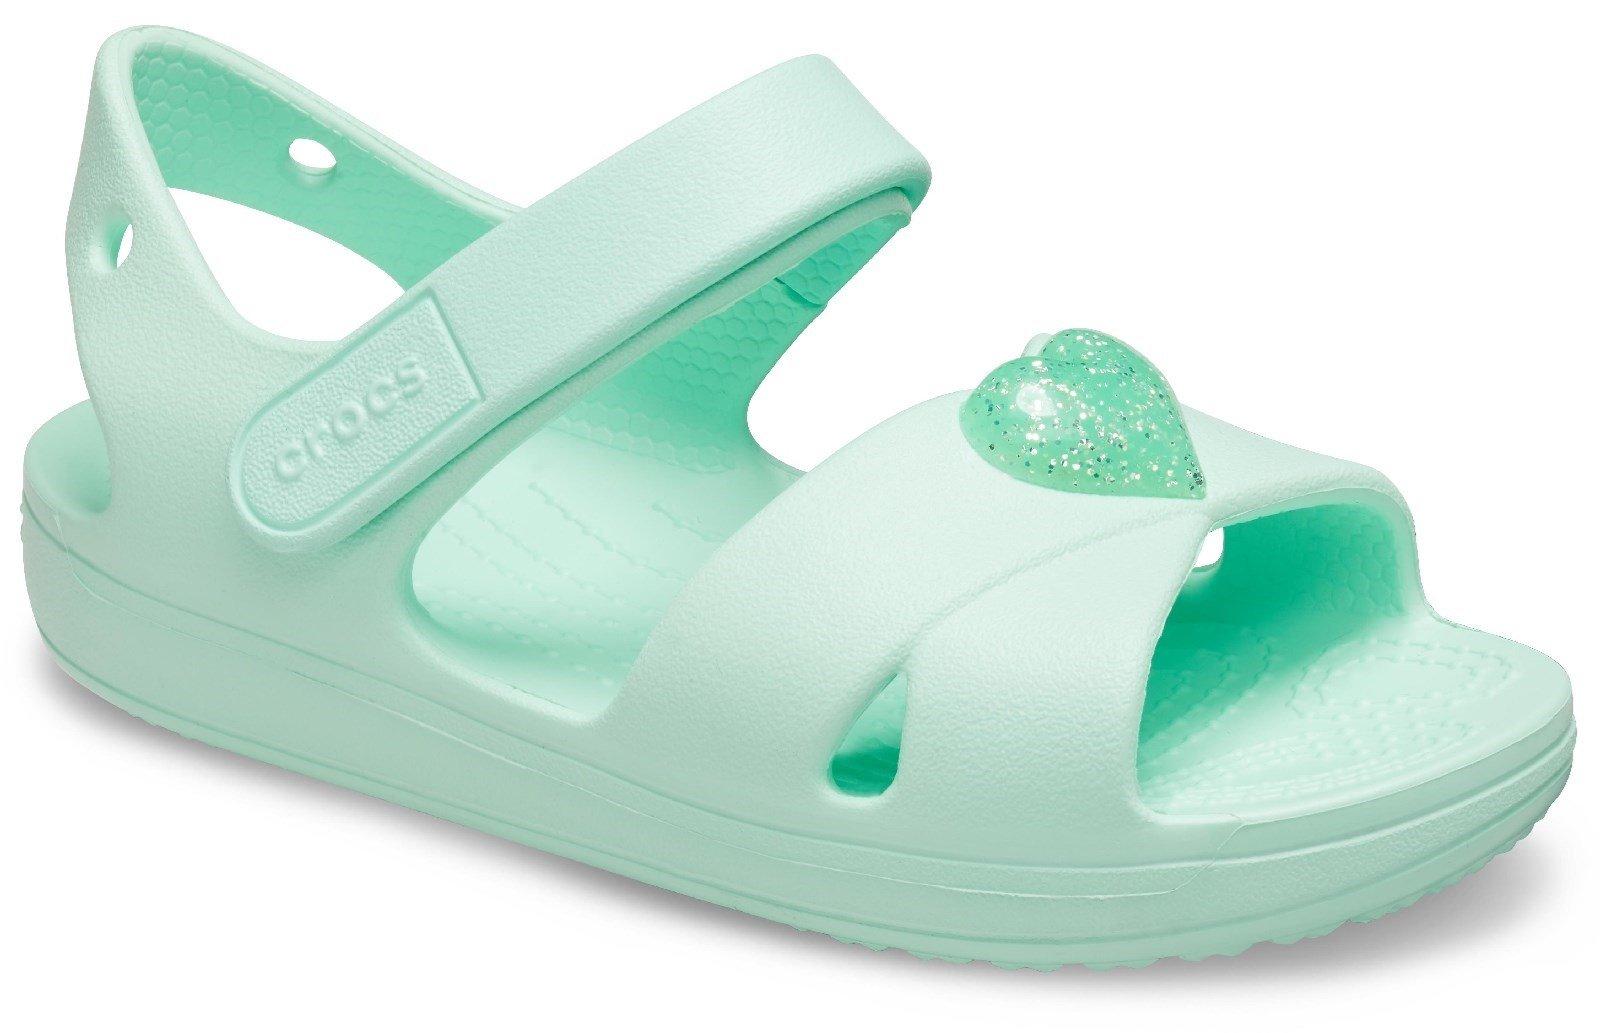 Crocs Kid's Cross Strap Sandal Mint Green 30710 - Mint Green 12 UK